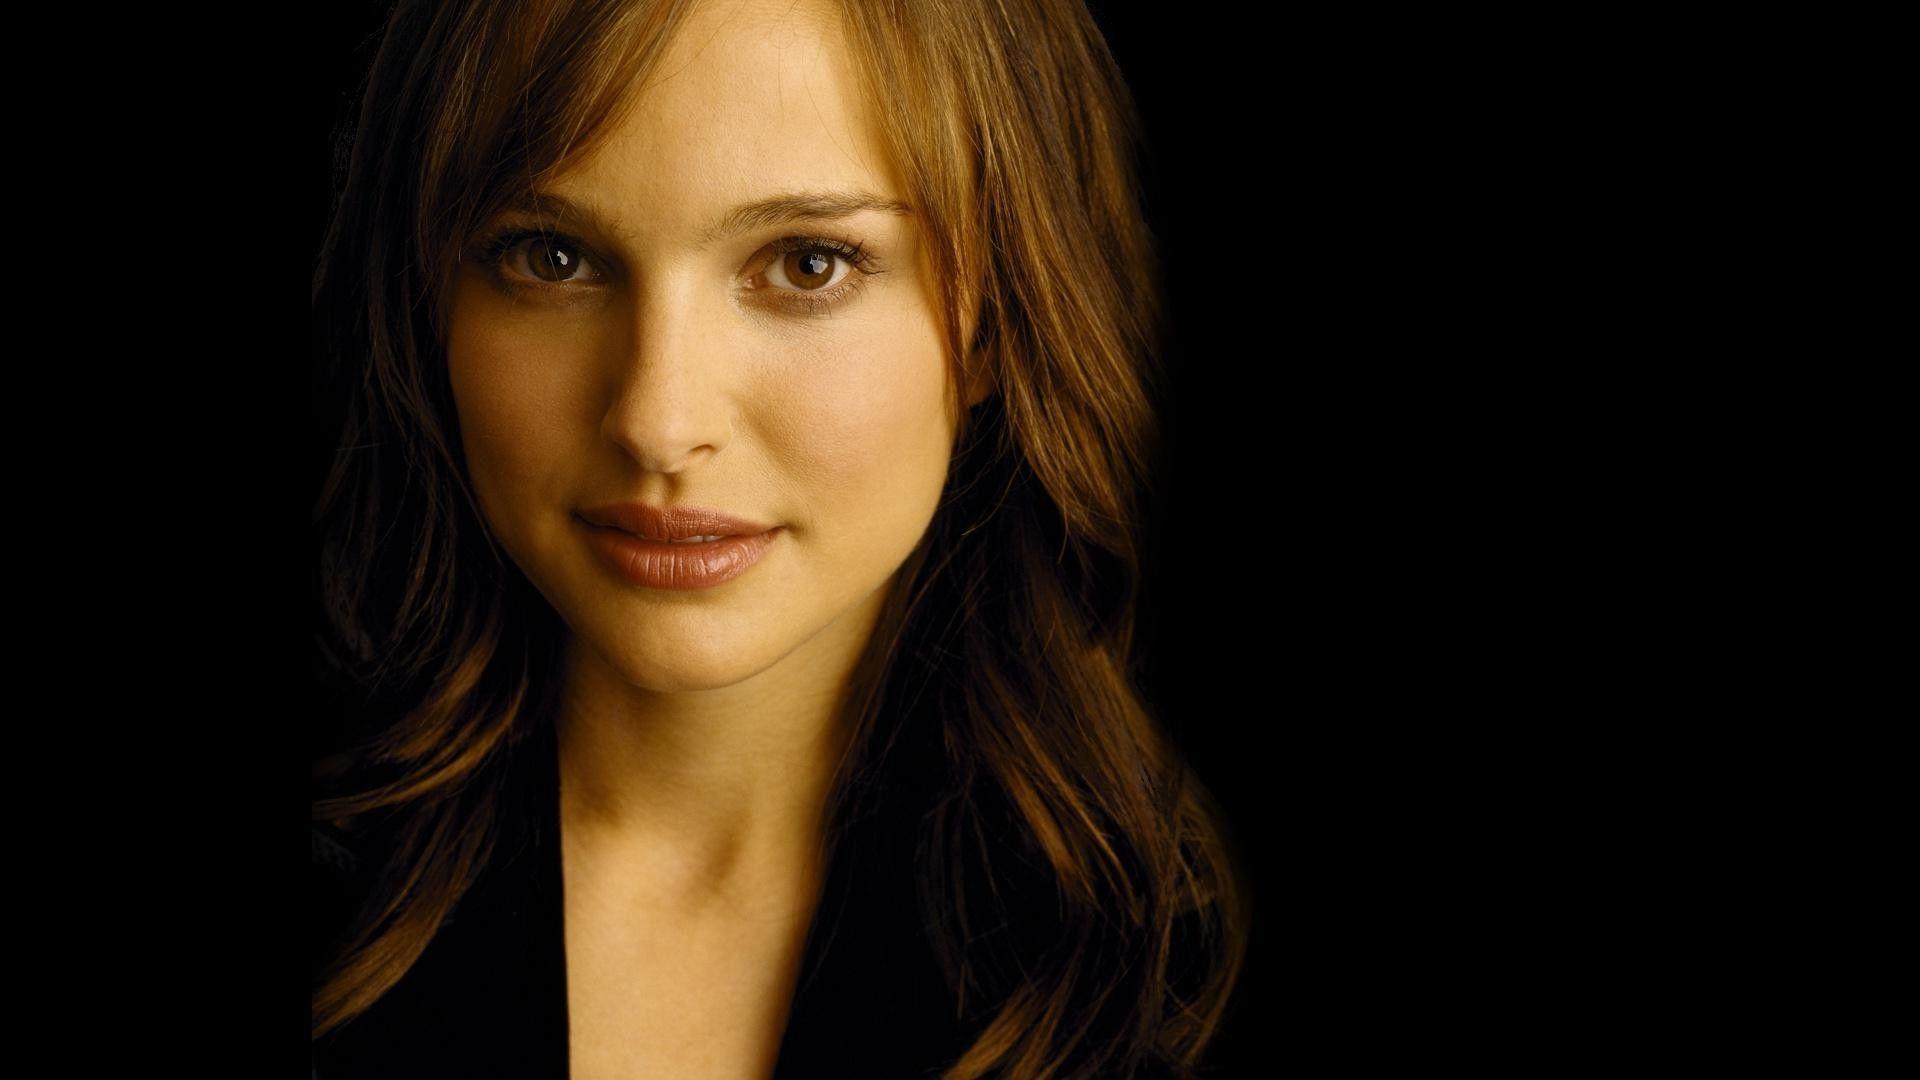 Natalie Portman Wallpaper 1366x768 HD Wallpapers Pictures | HD ...